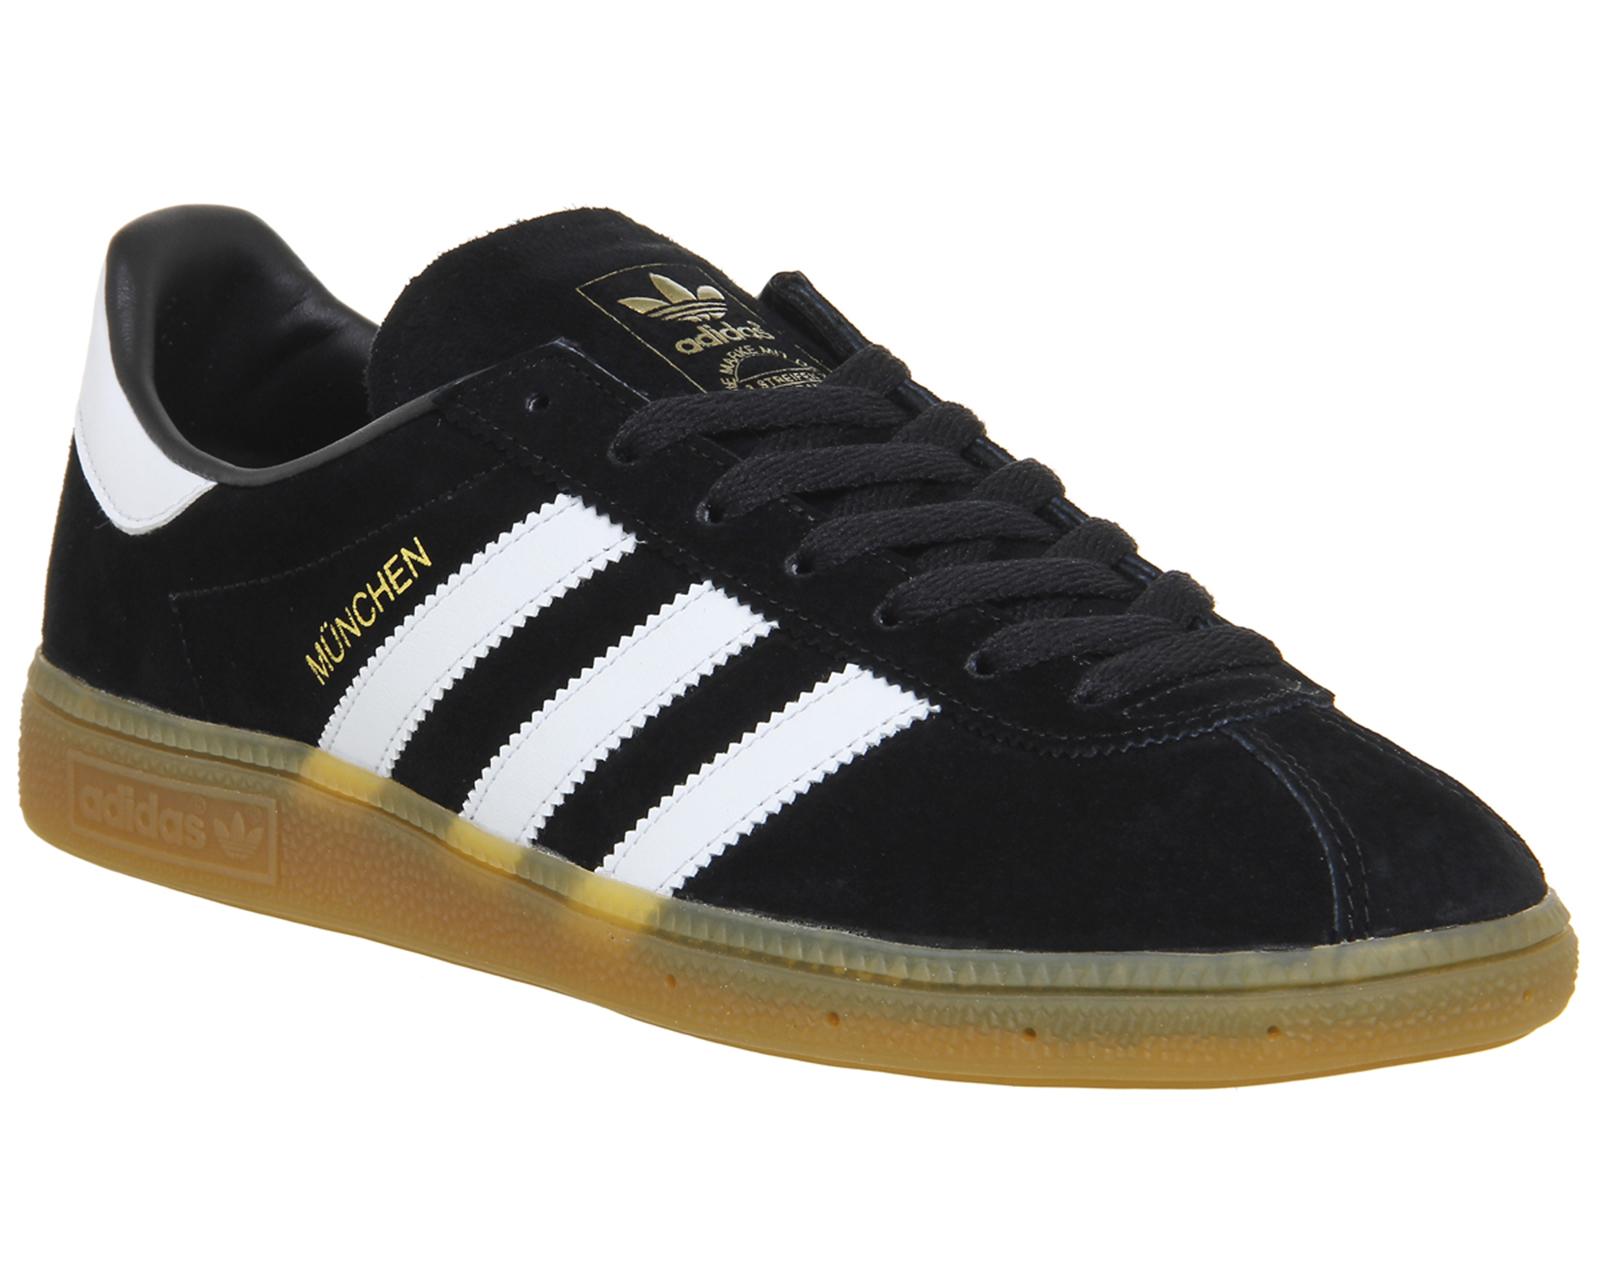 newest f7ad2 9d691 CENTINELA Adidas Munchen negro blanco zapatillas zapatos